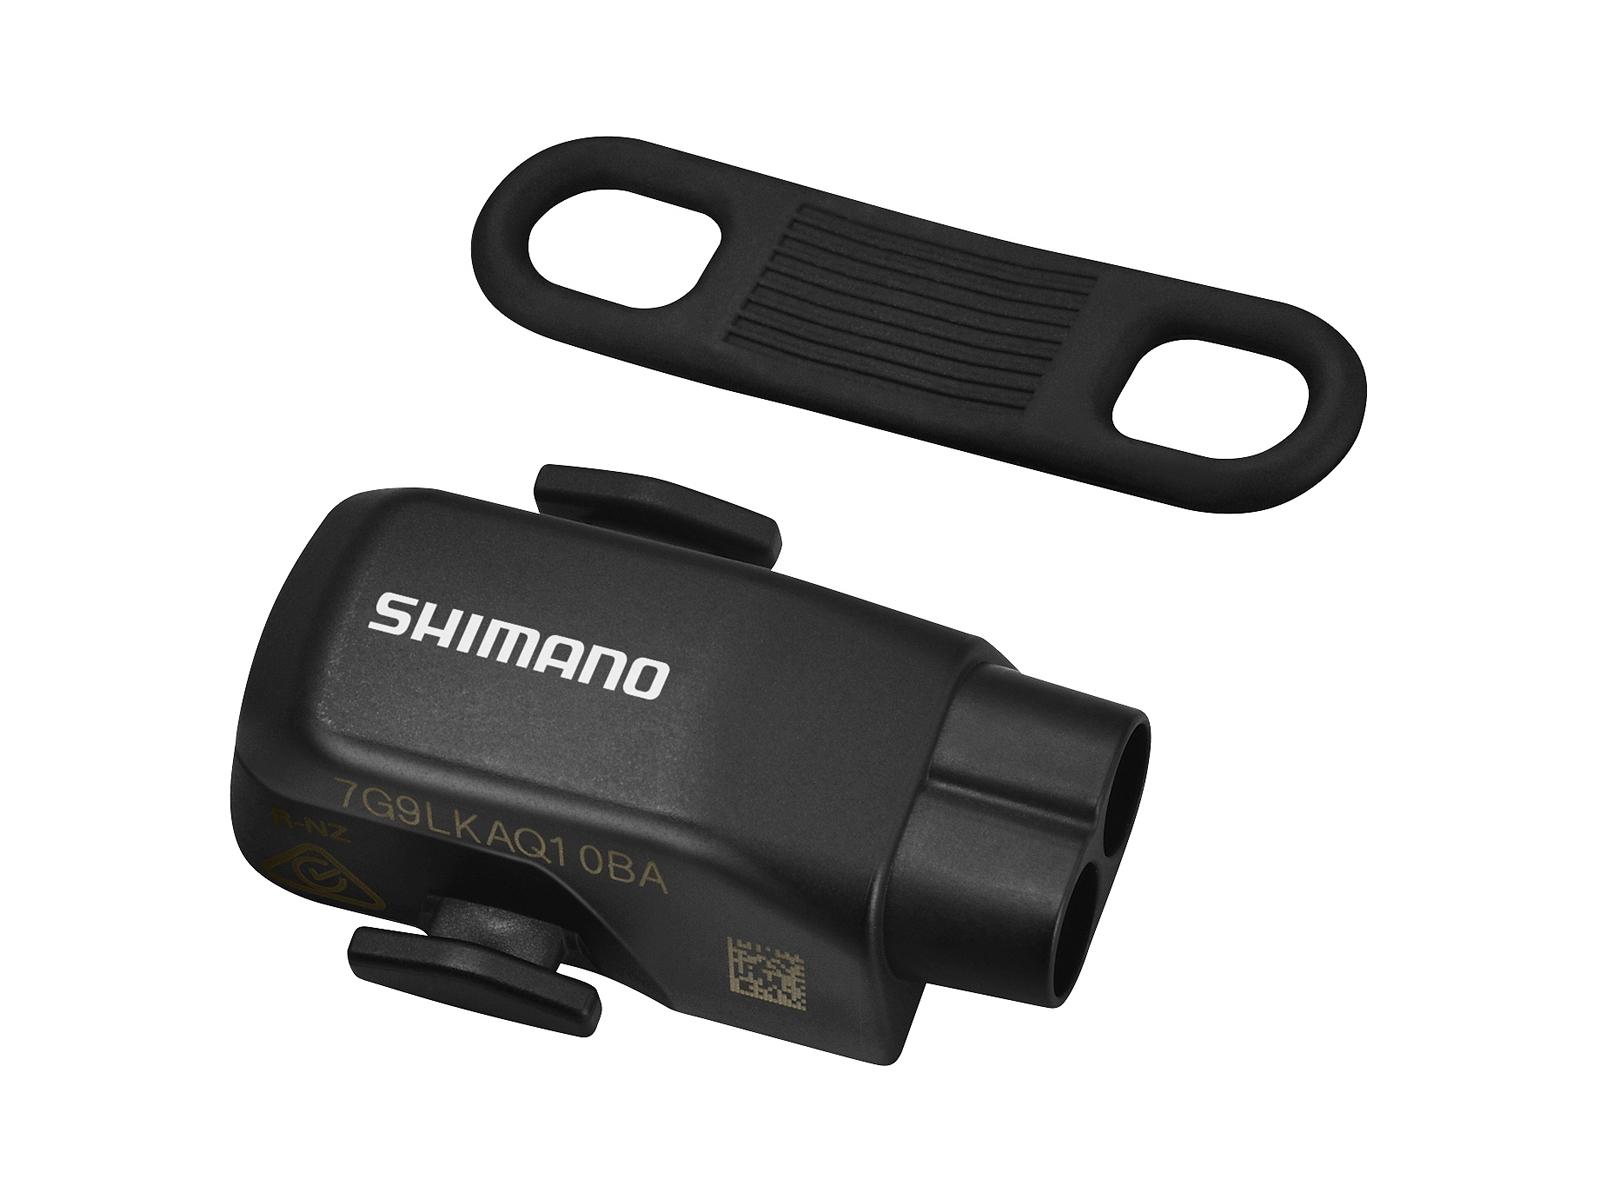 Shimano Ew-Wu101 Trådlös Enhet För Di2 E-Tube X2